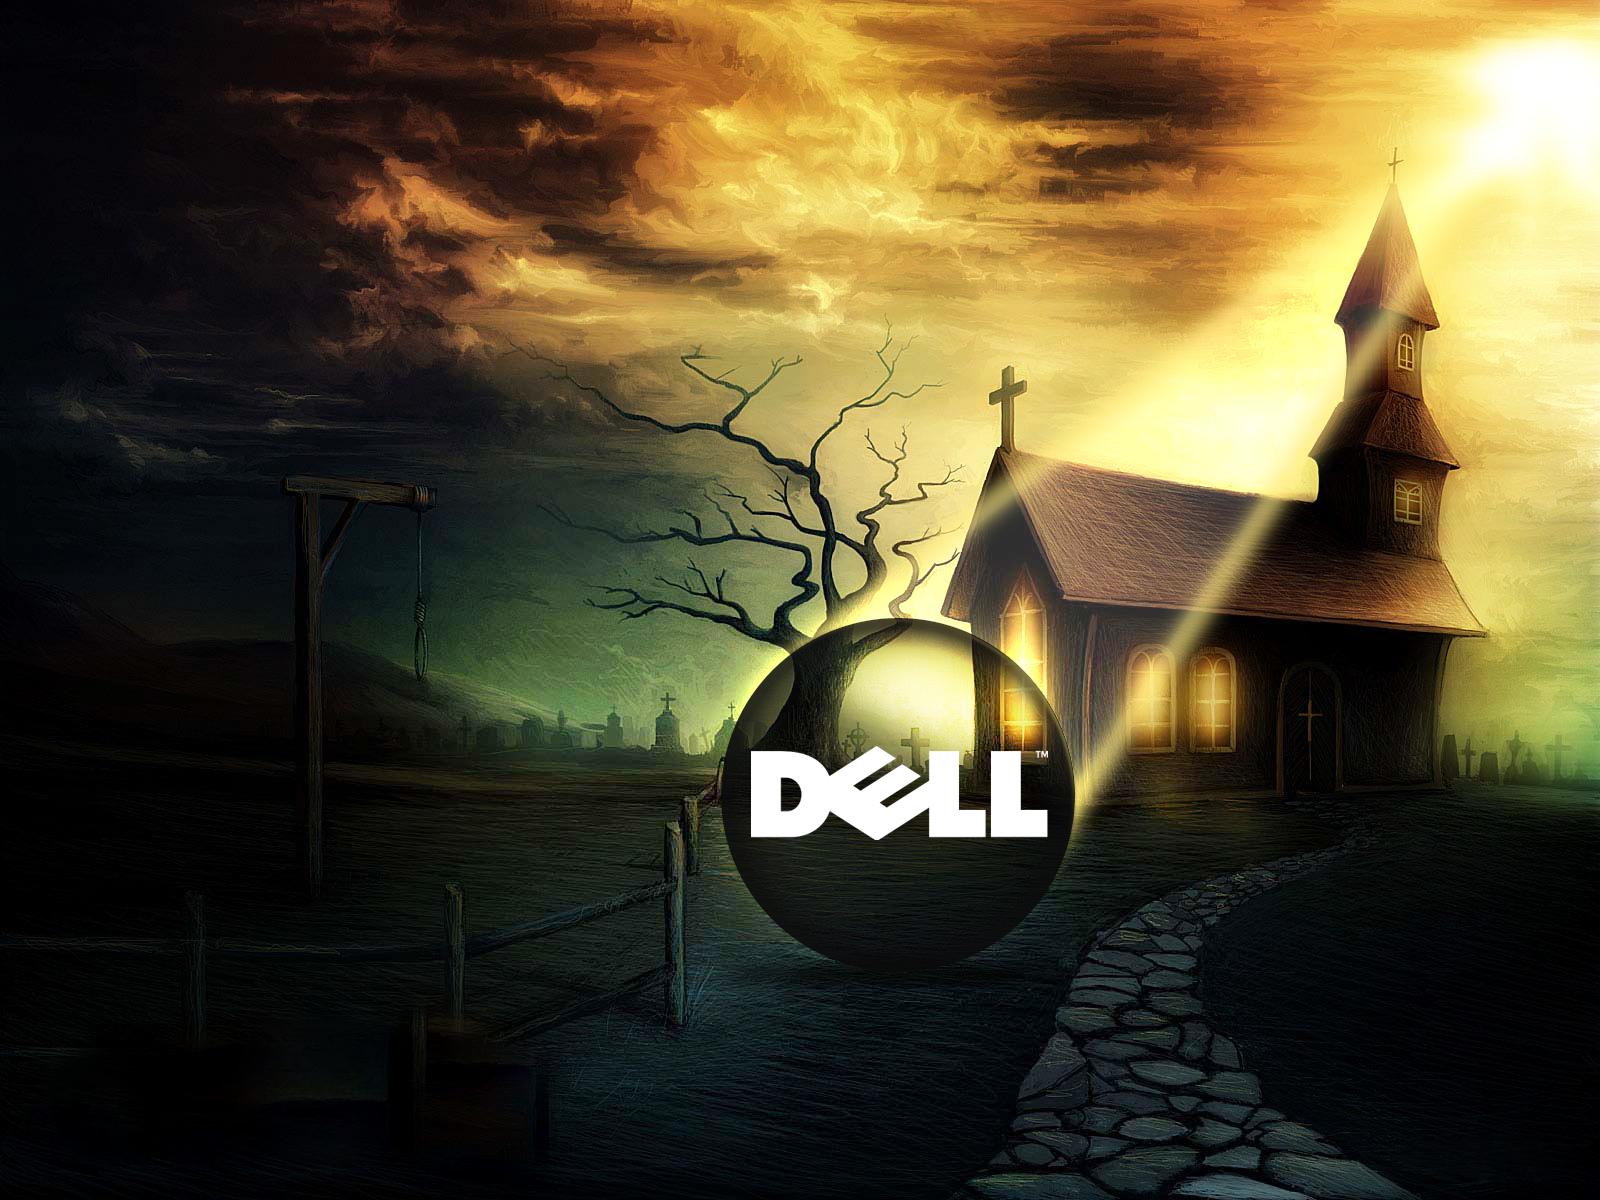 Dell Inspiron Wallpaper Background 33N129Sjpg   Picseriocom 1600x1200